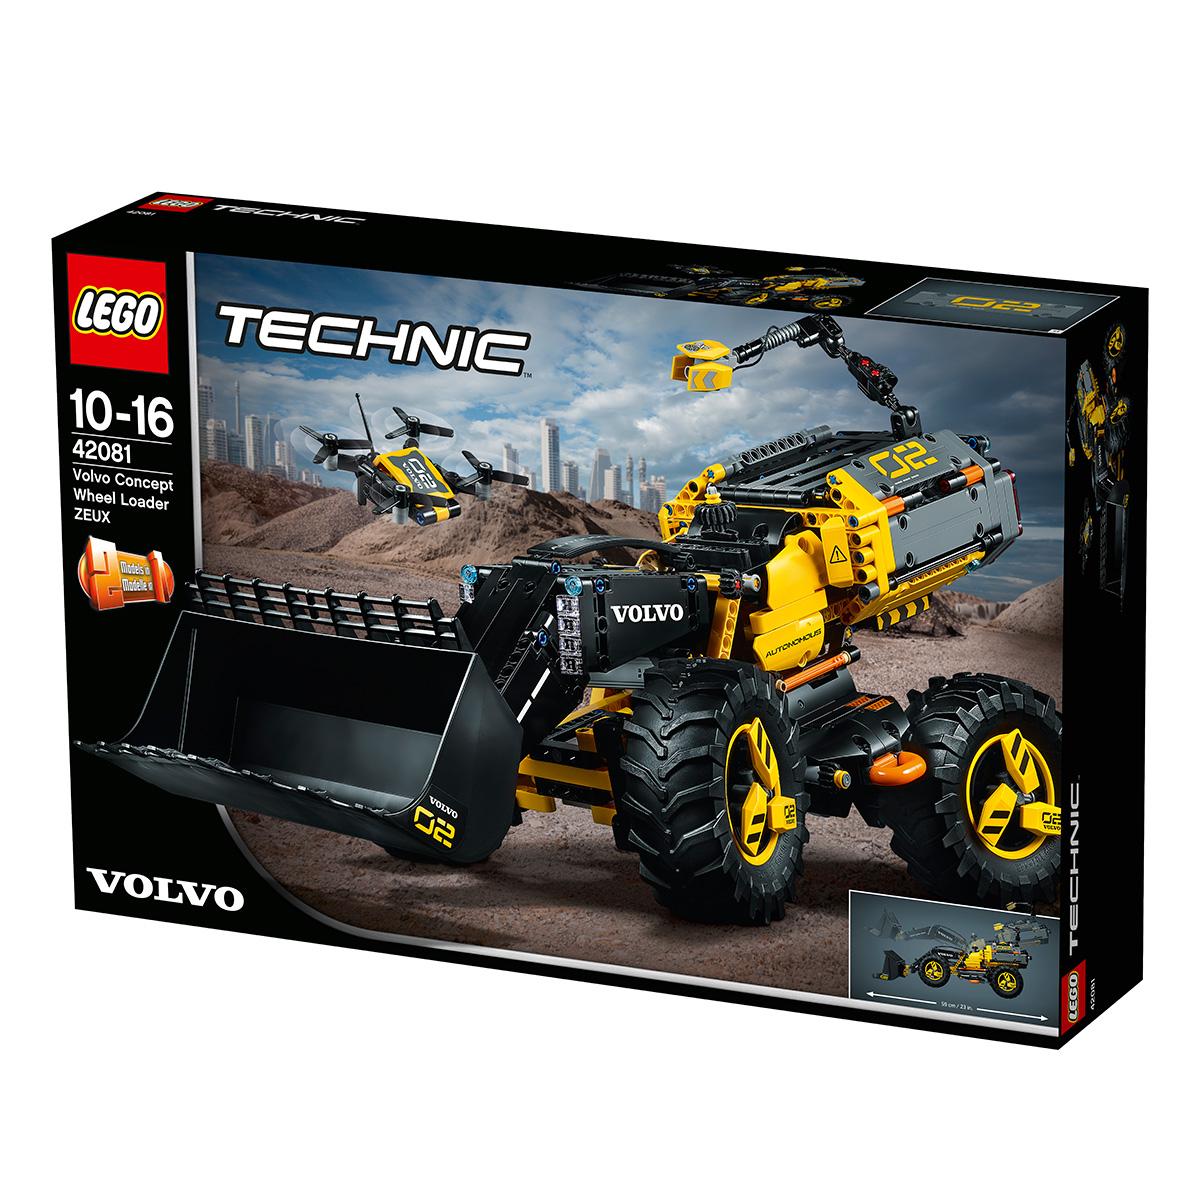 LEGO Technic Volvo konceptkøretøj - Gummiged ZEUX